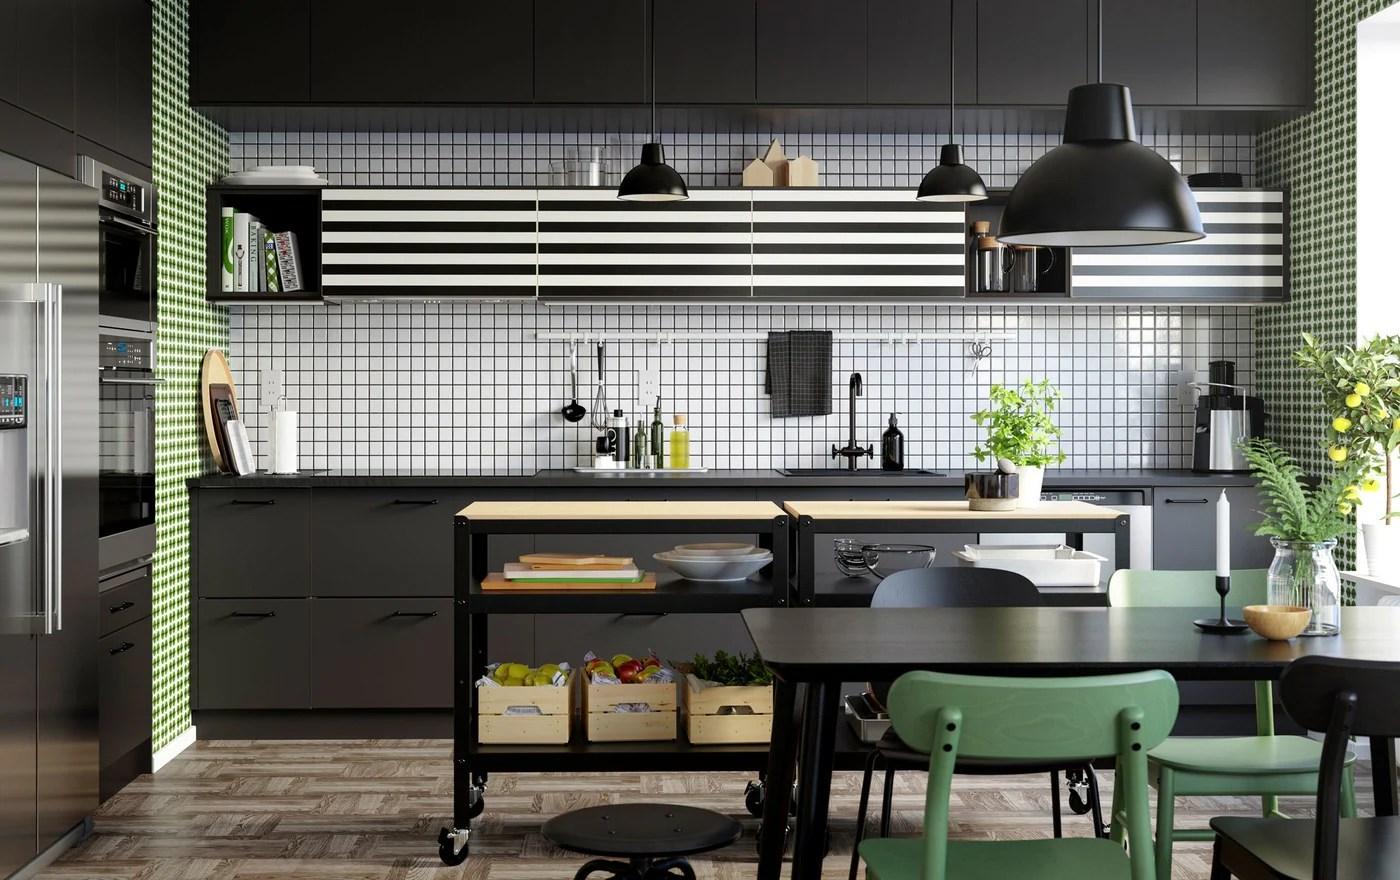 Top Rated Kitchen Design App